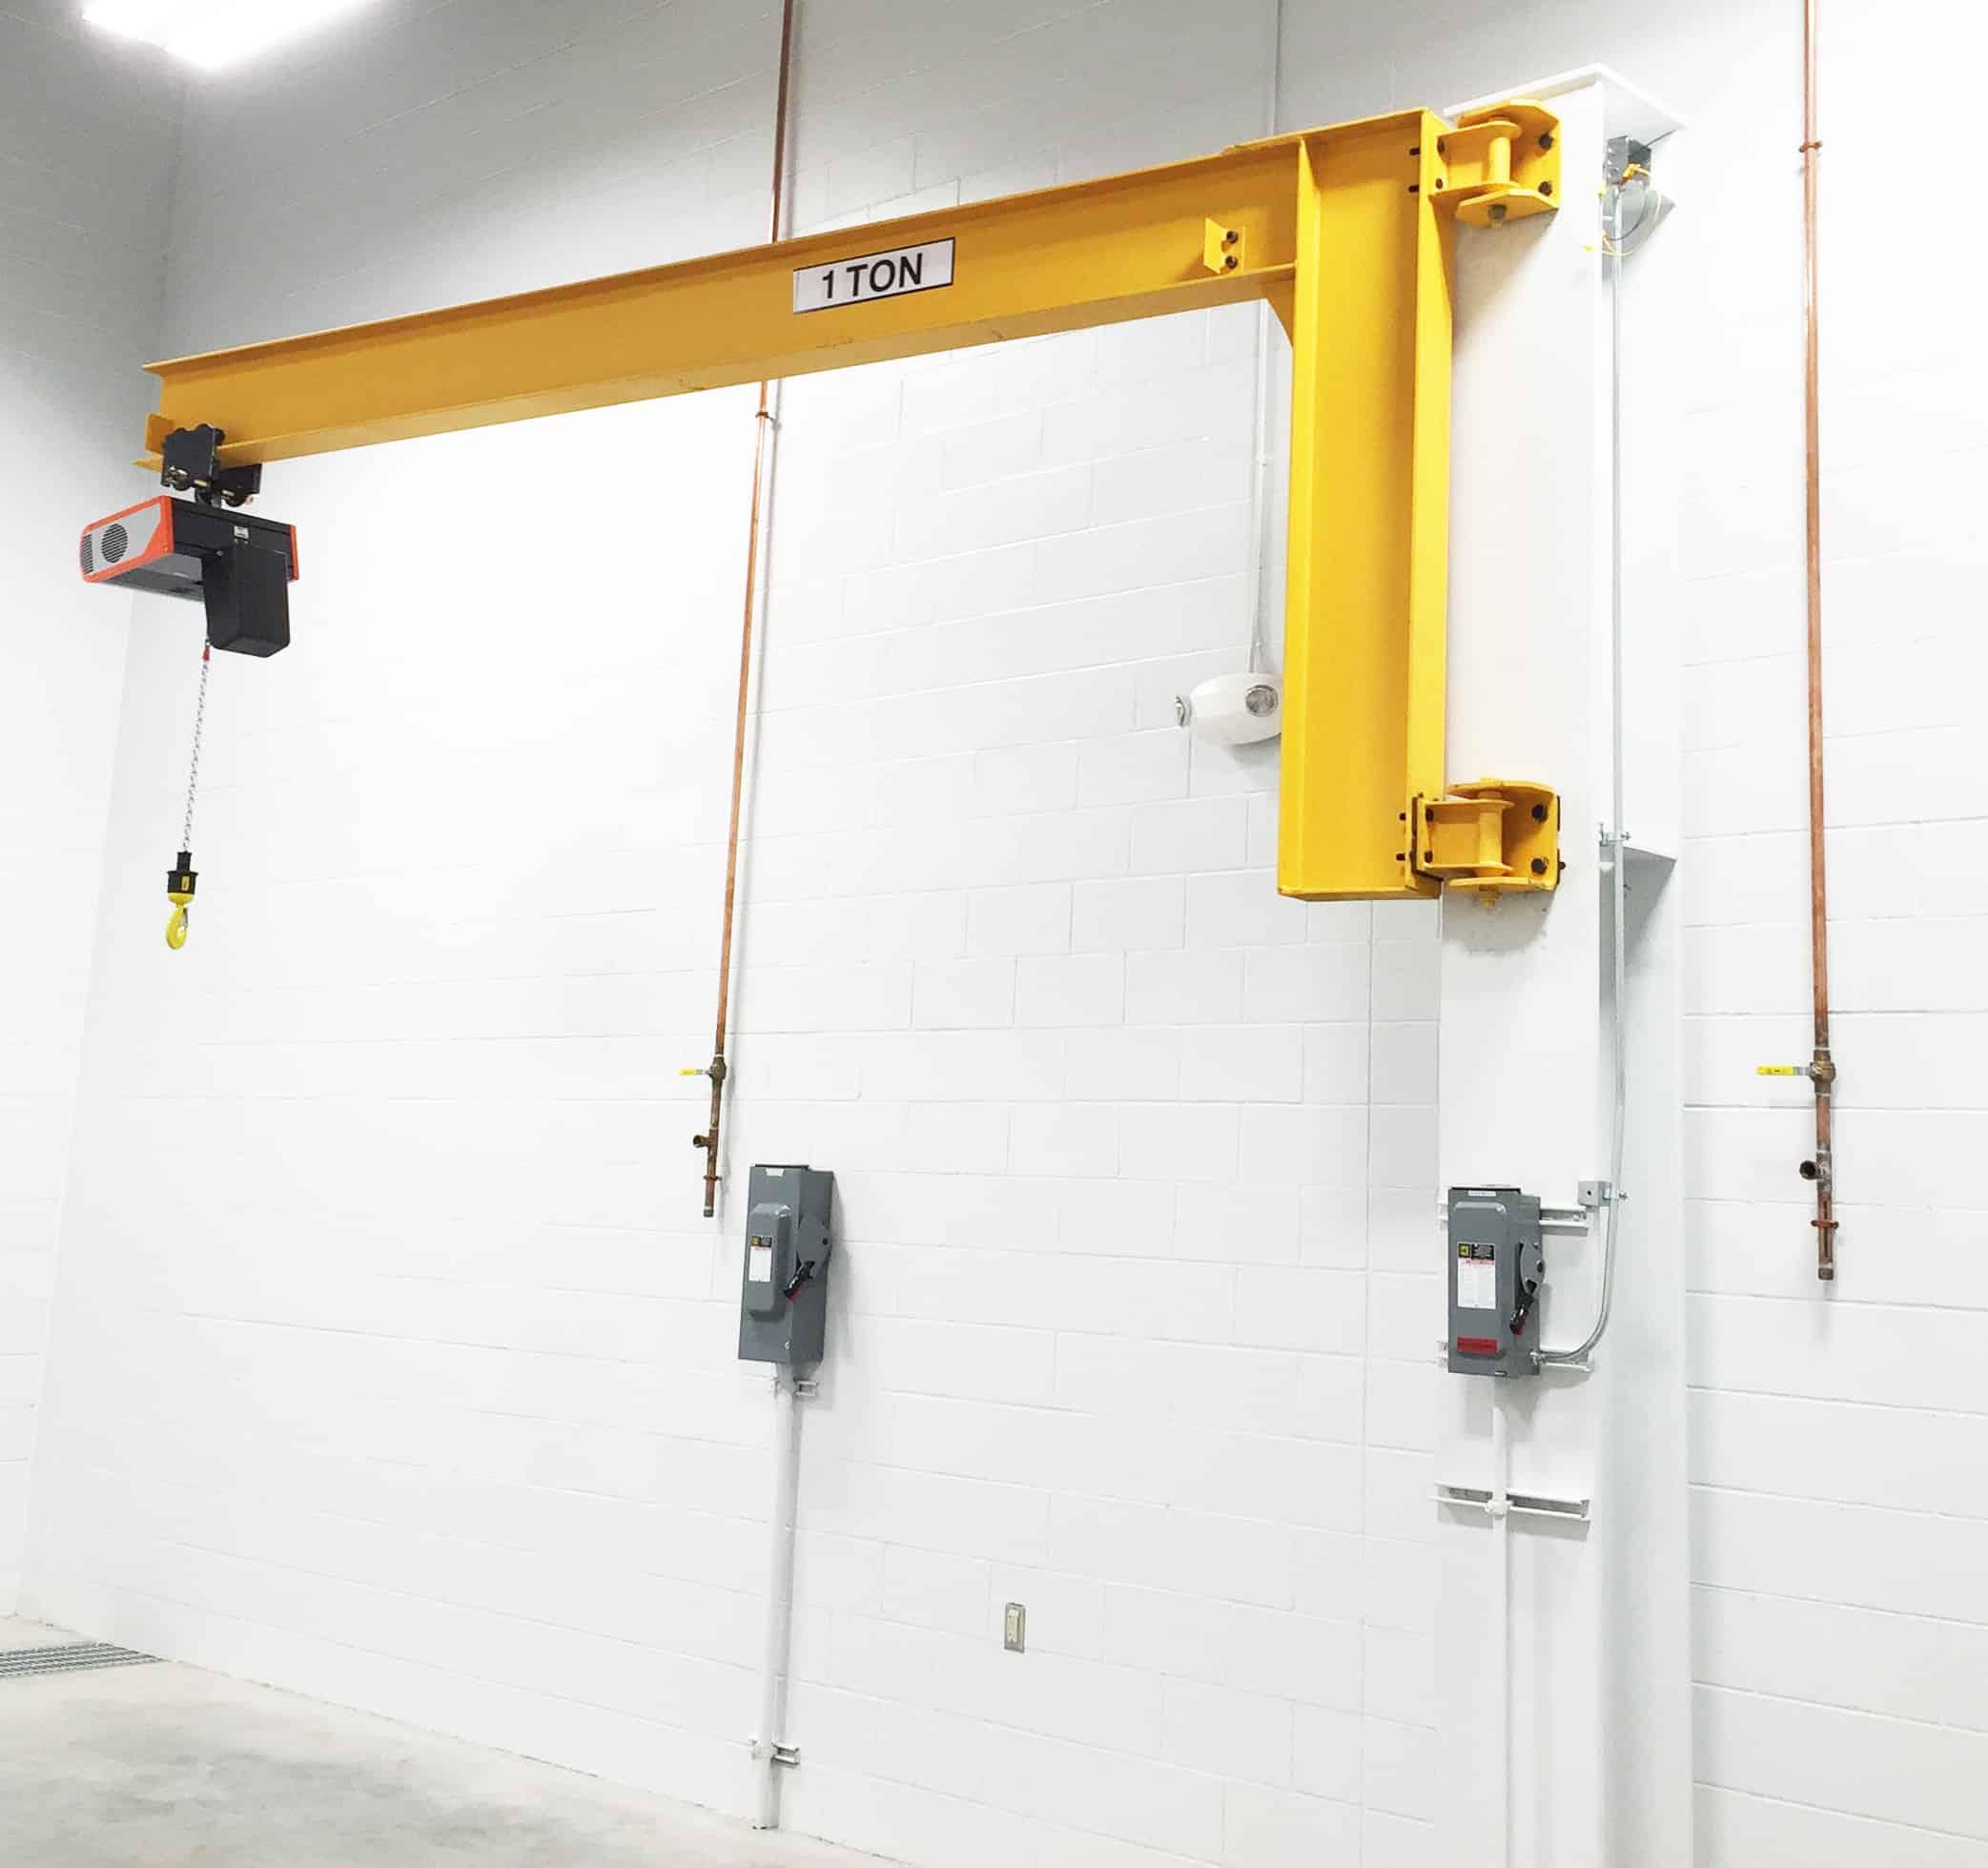 Wall Bracket Cantilever Jib Crane | Wallace Cranes